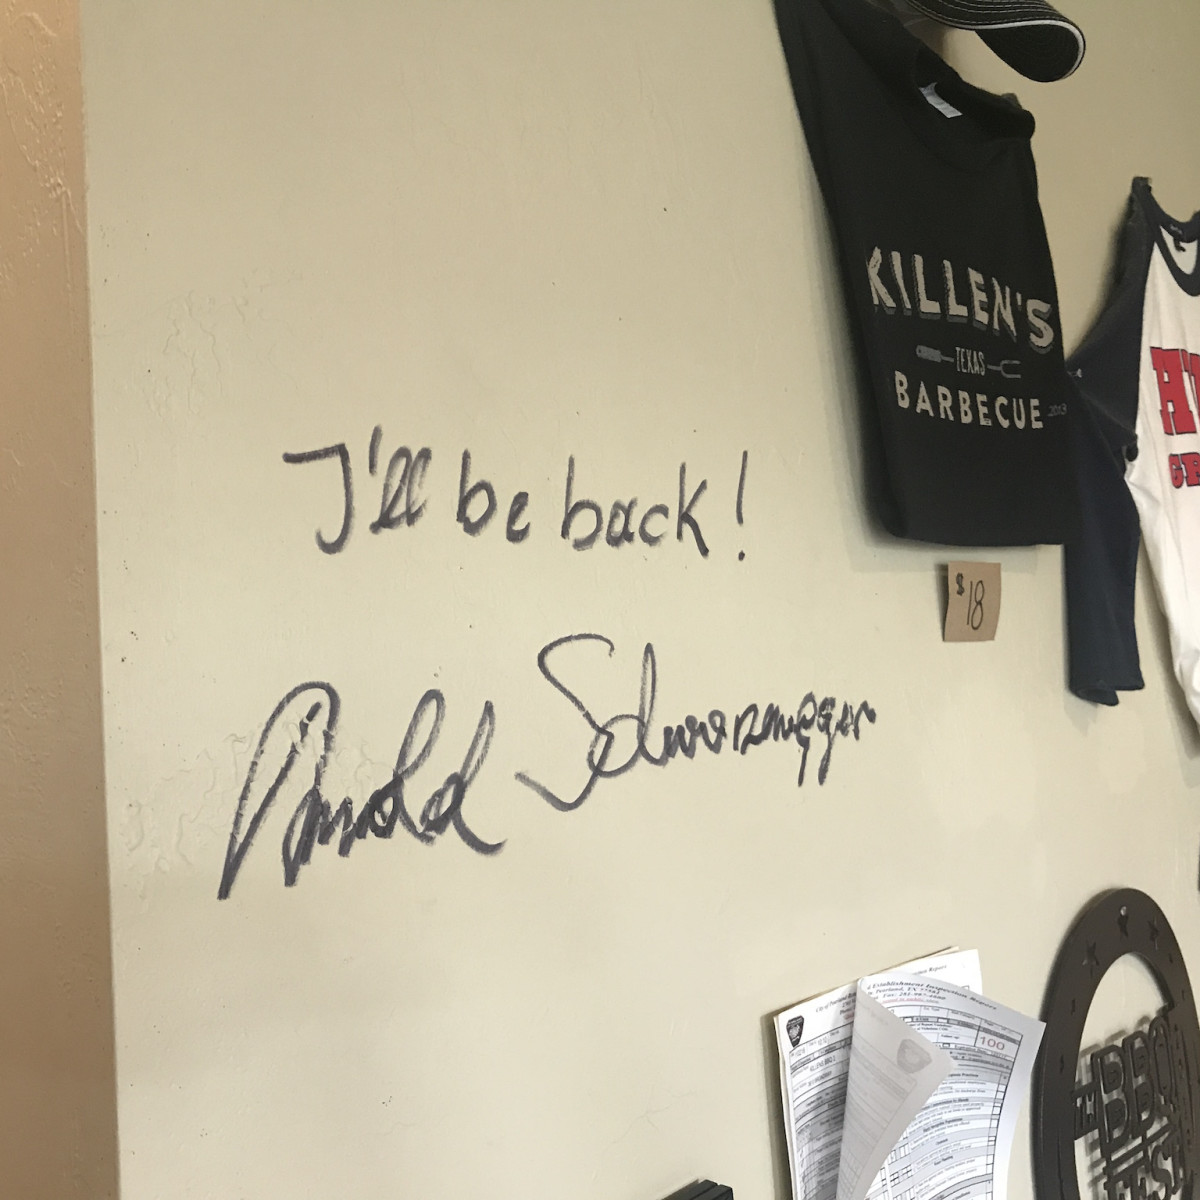 Killen's Barbecue Arnold Schwarzenegger autograph